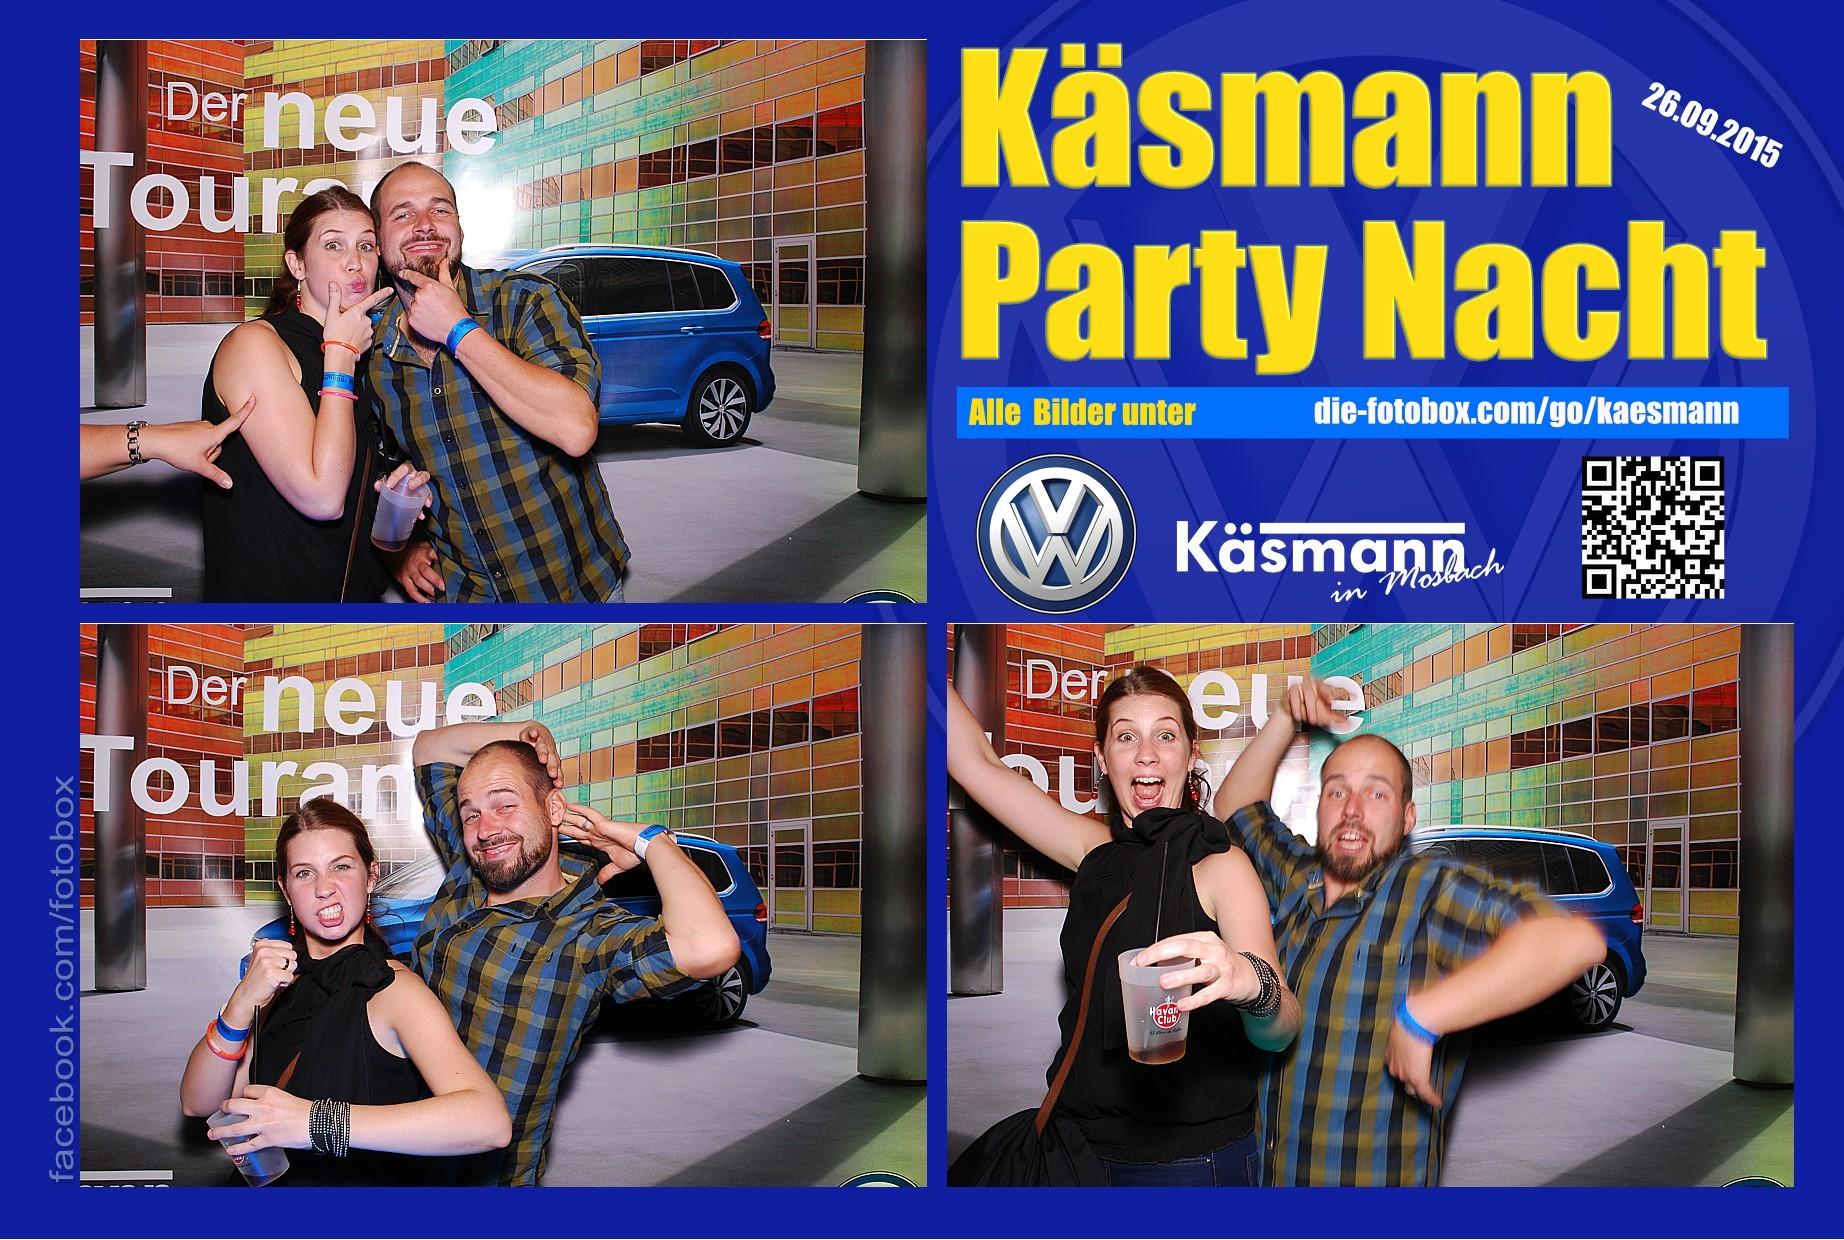 Käsmannparty 2015 - www.die-fotobox.com 00964